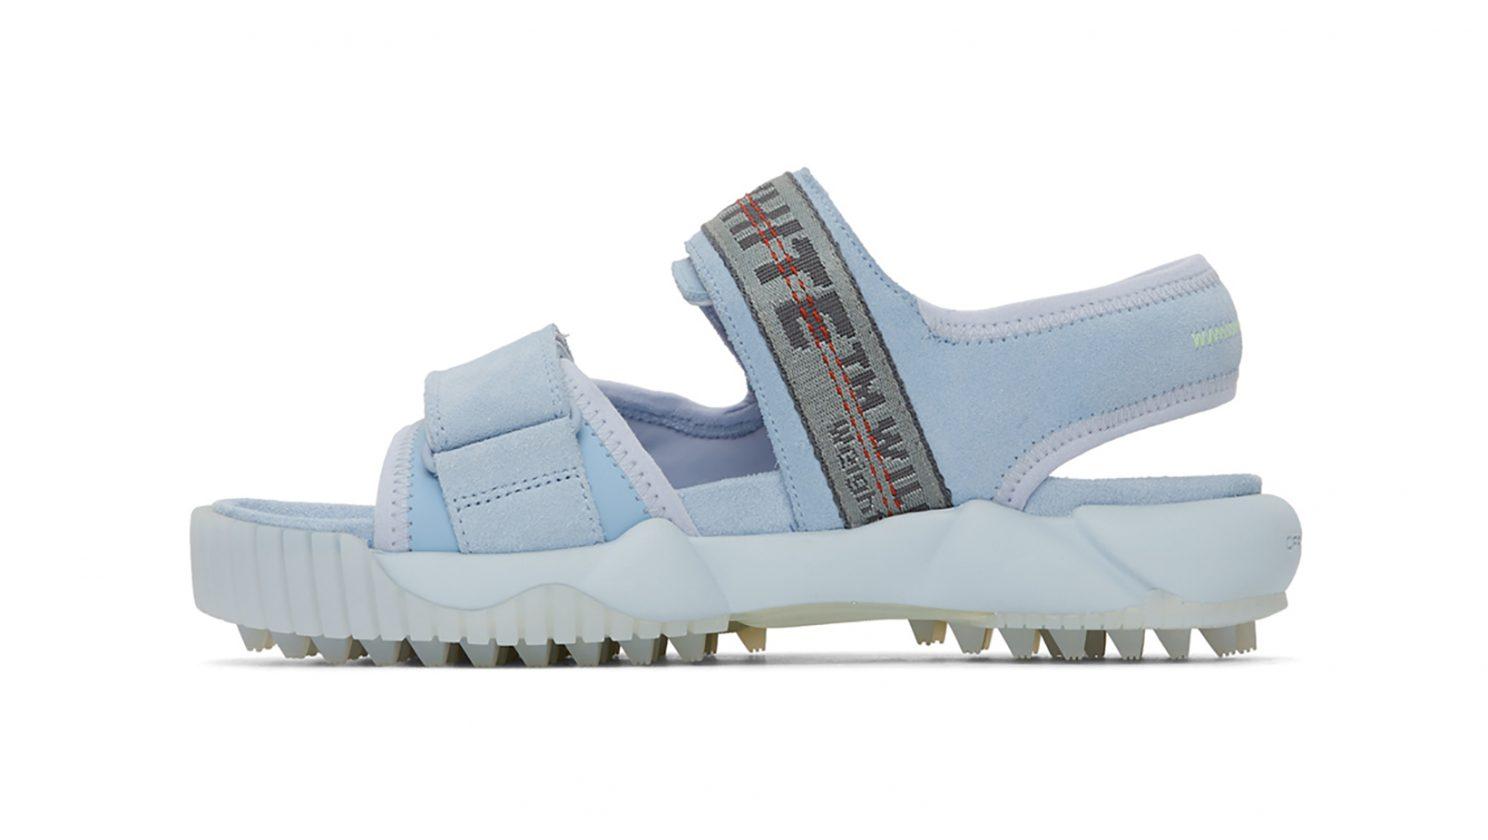 off-white-virgil-abloh-oddsy-minimal-trekking-sandals-blue-beige-black-shoes-release-2